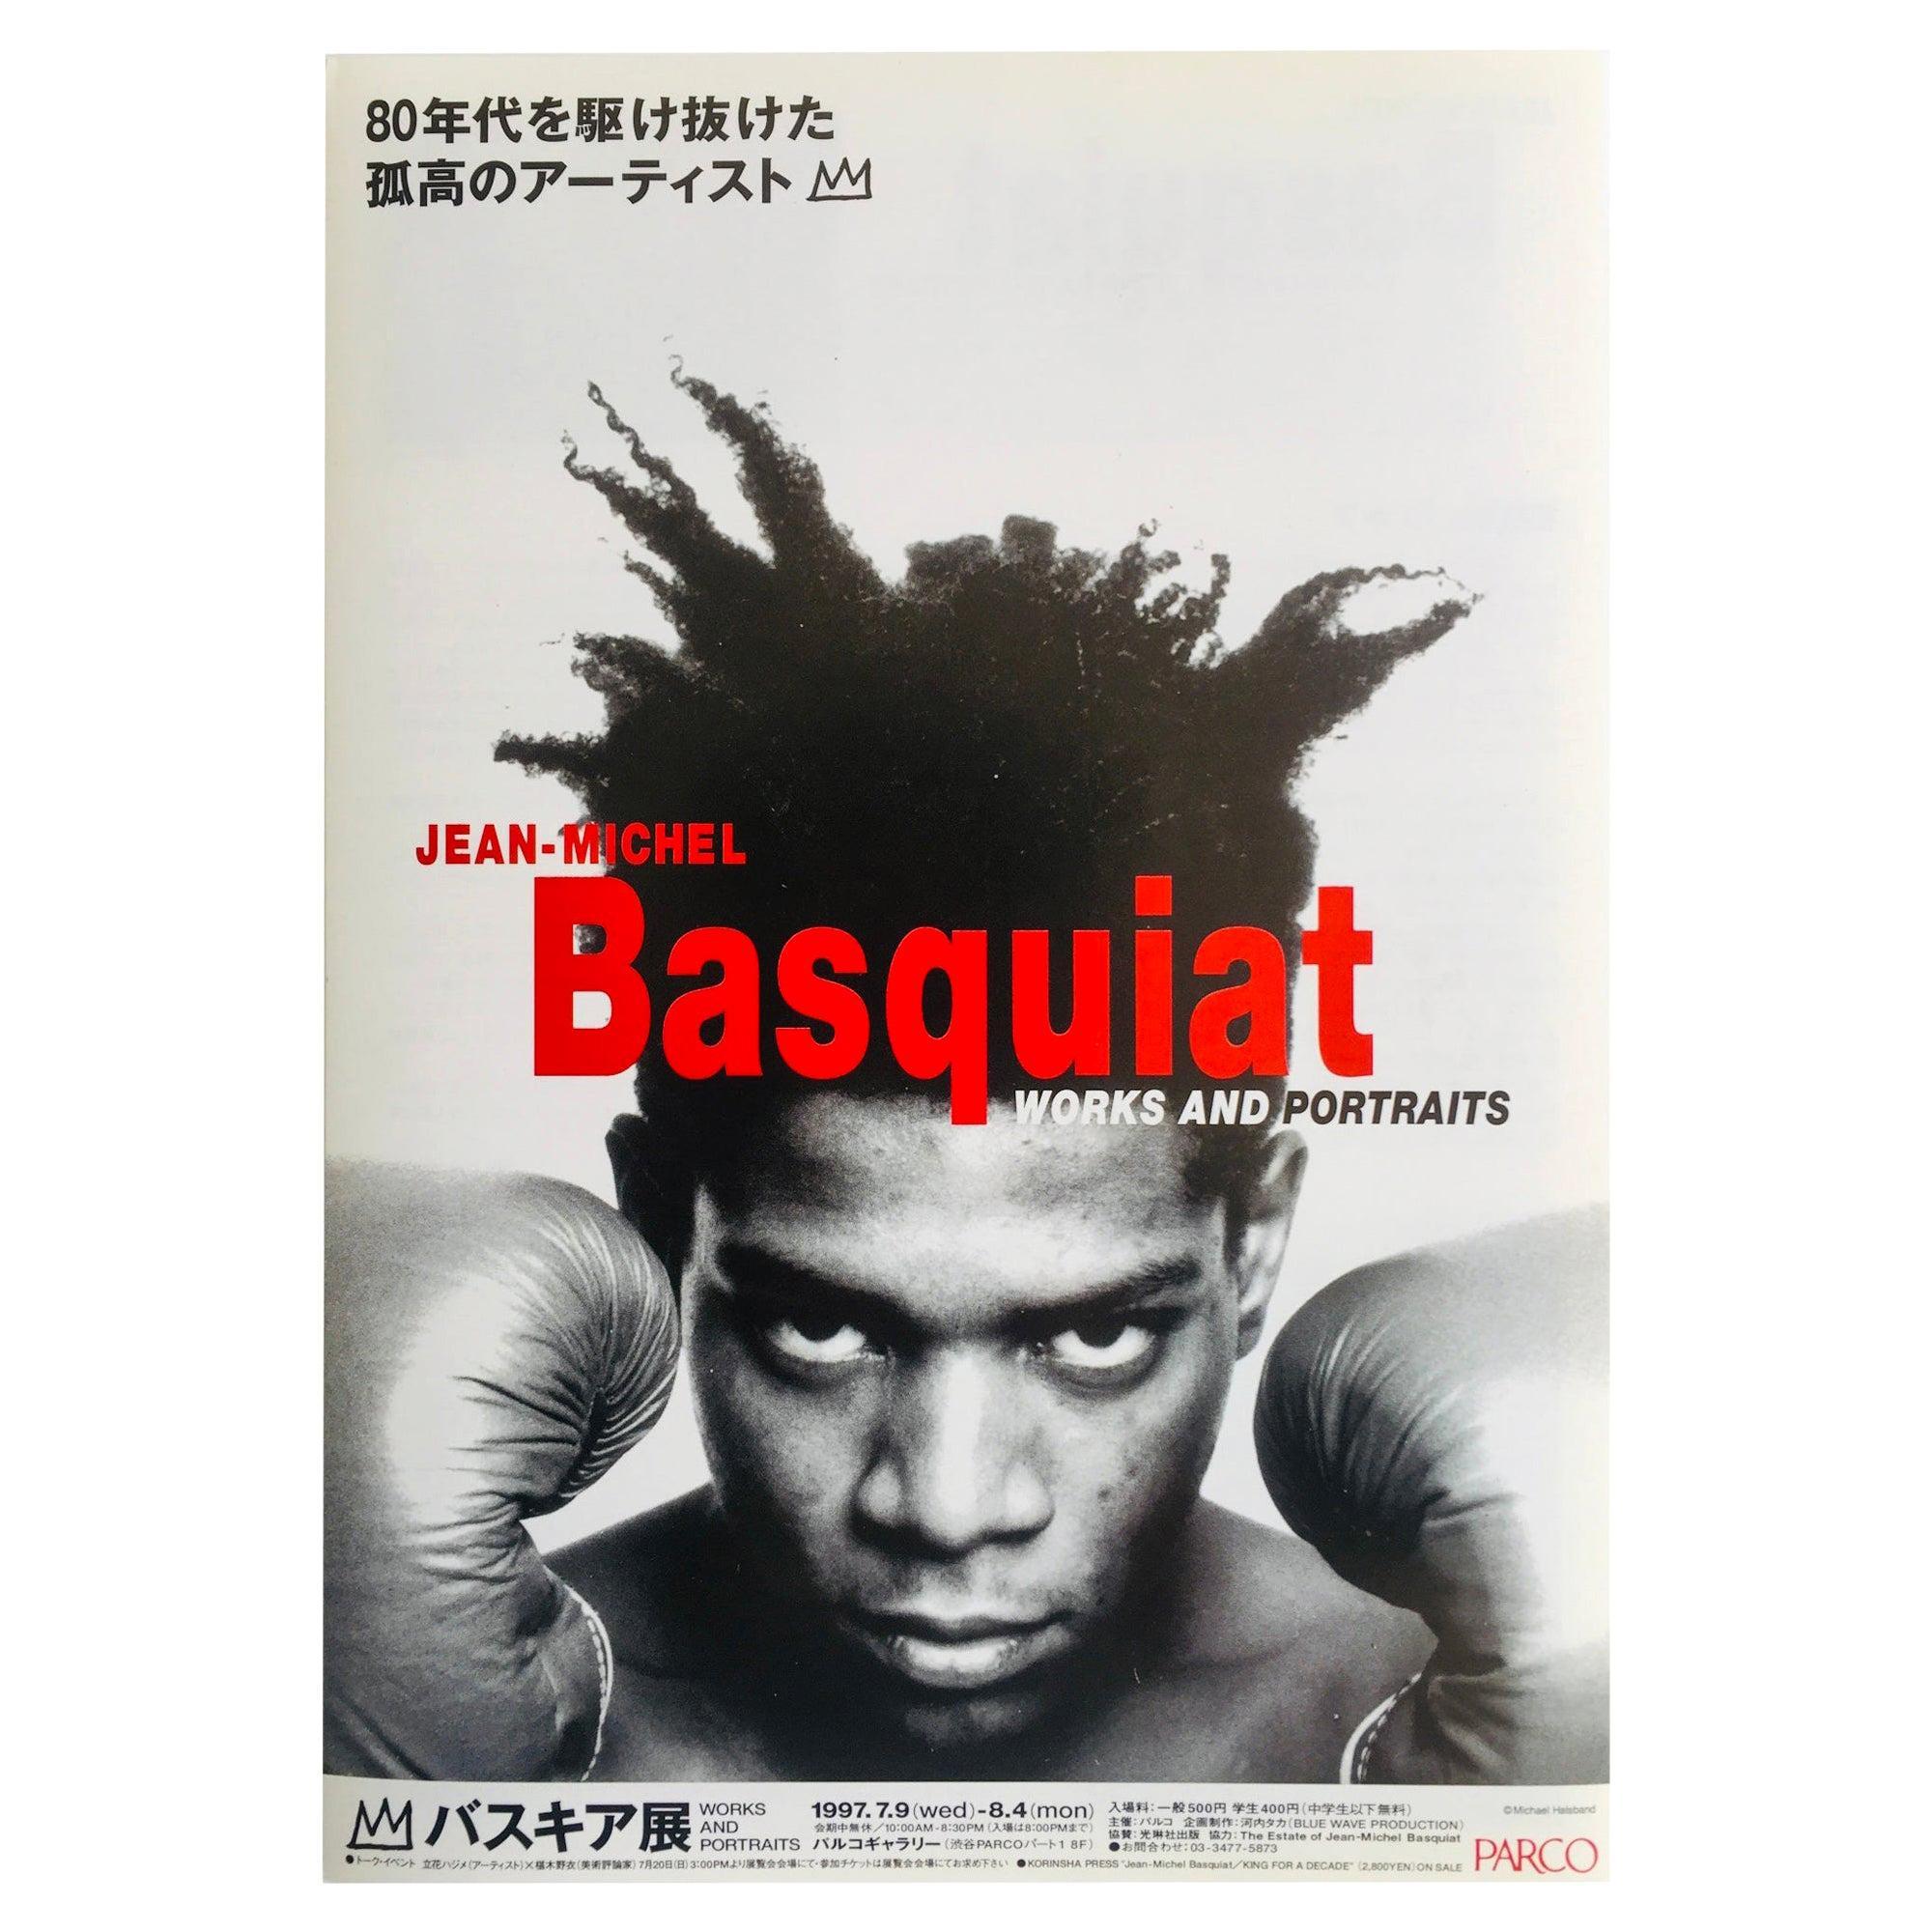 Basquiat Boxing Poster, Japan, 1997